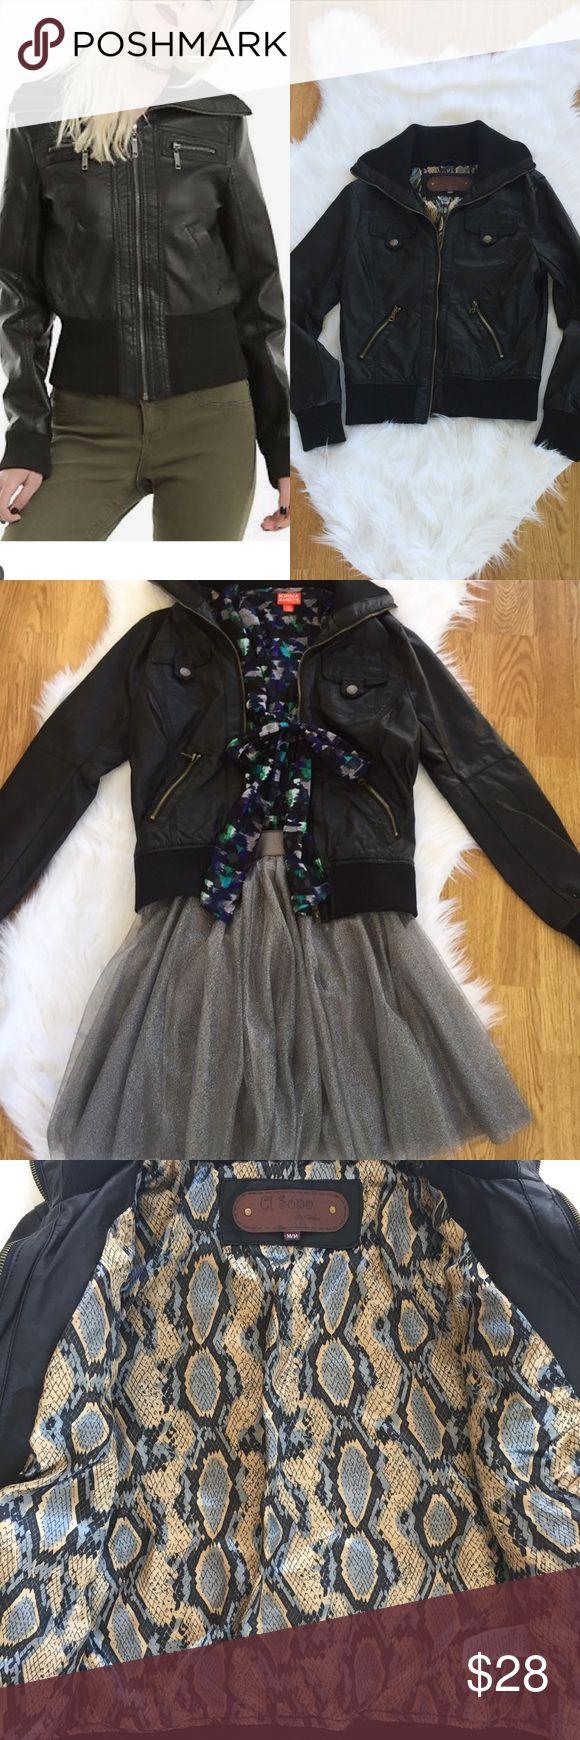 BLACK FAUX LEATHER JACKET Black faux leather jacket. Great versatile item. Pockets have zippers. Fun print on inside of jacket. Ci Sono Jackets & Coats